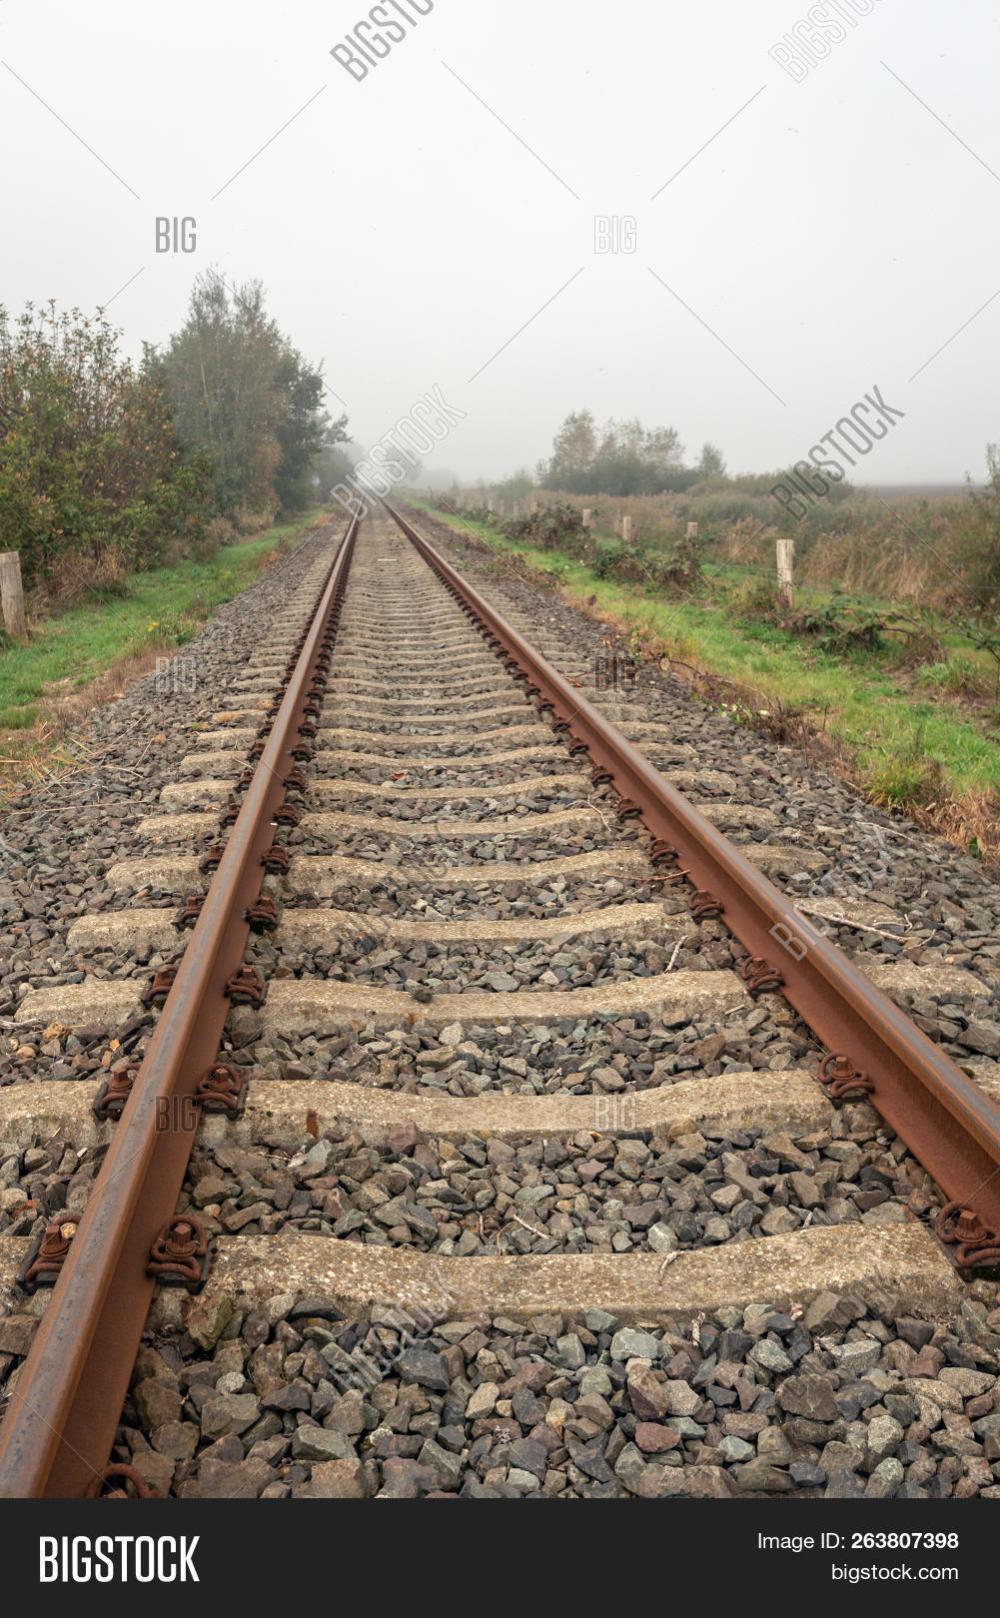 medium resolution of rusty single track image photo free trial bigstock single track wiring model train